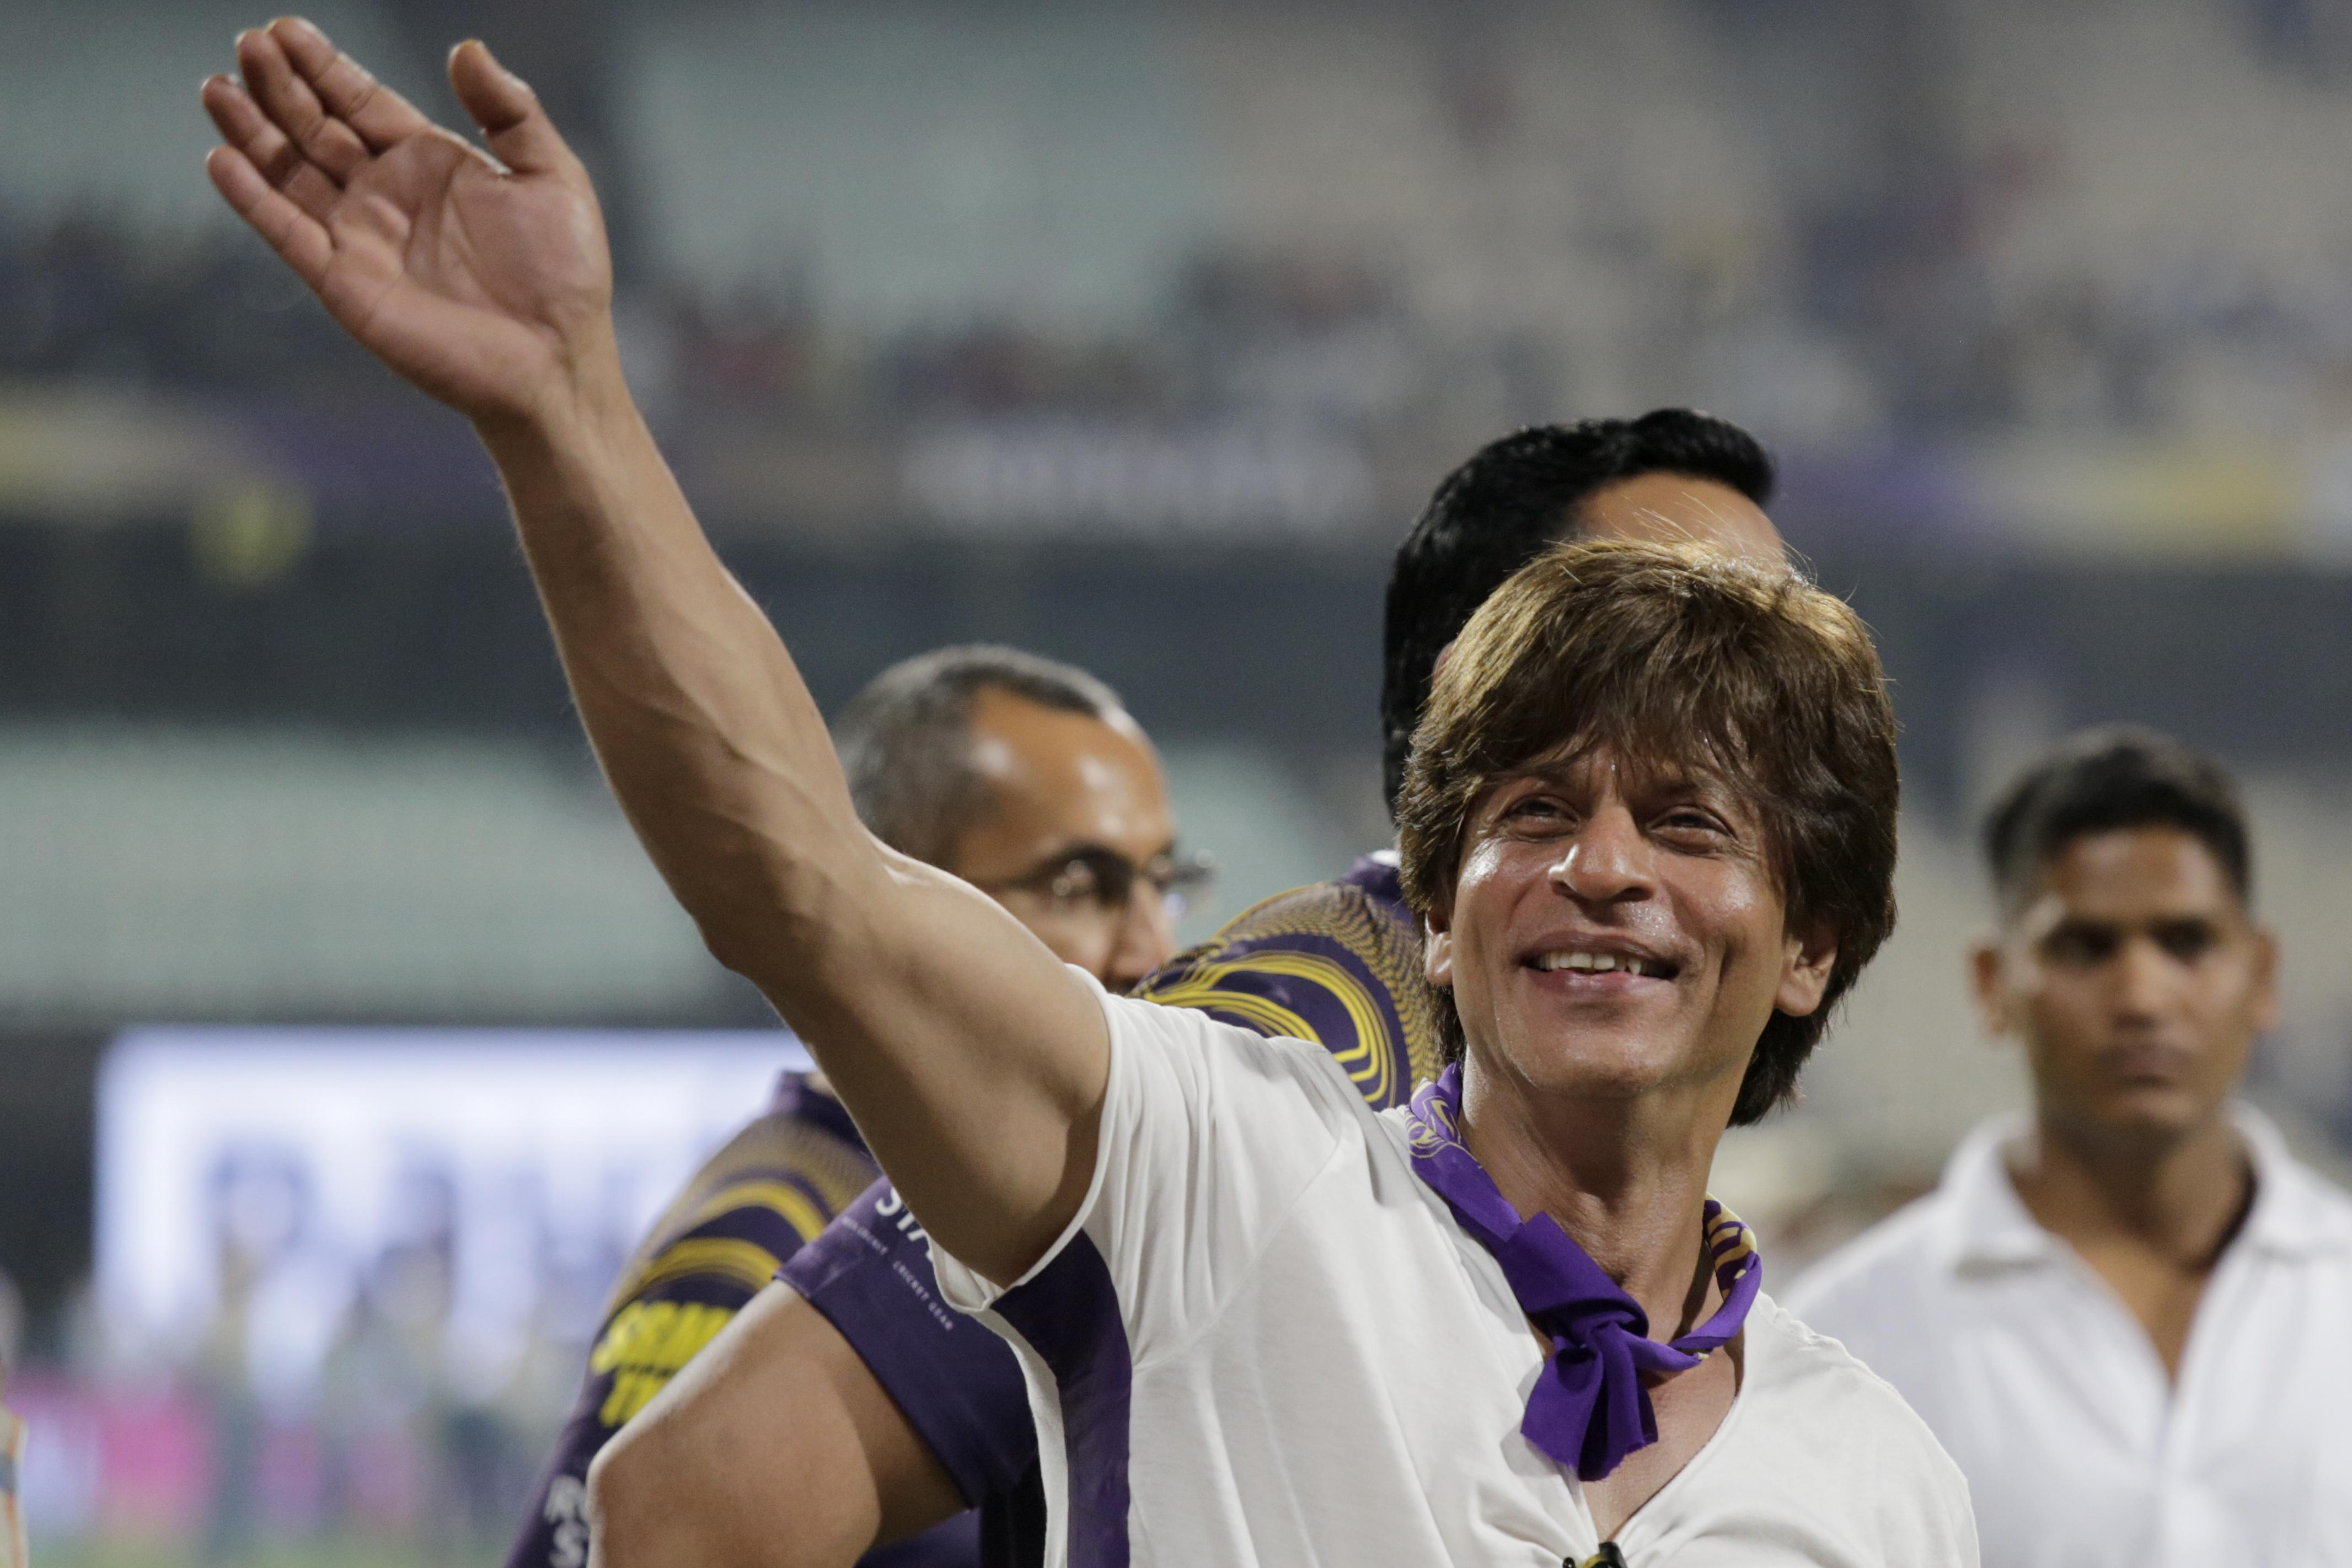 The 'King of Bollywood' Shah Rukh Khan owns the Kolkata Knight Riders of the IPL